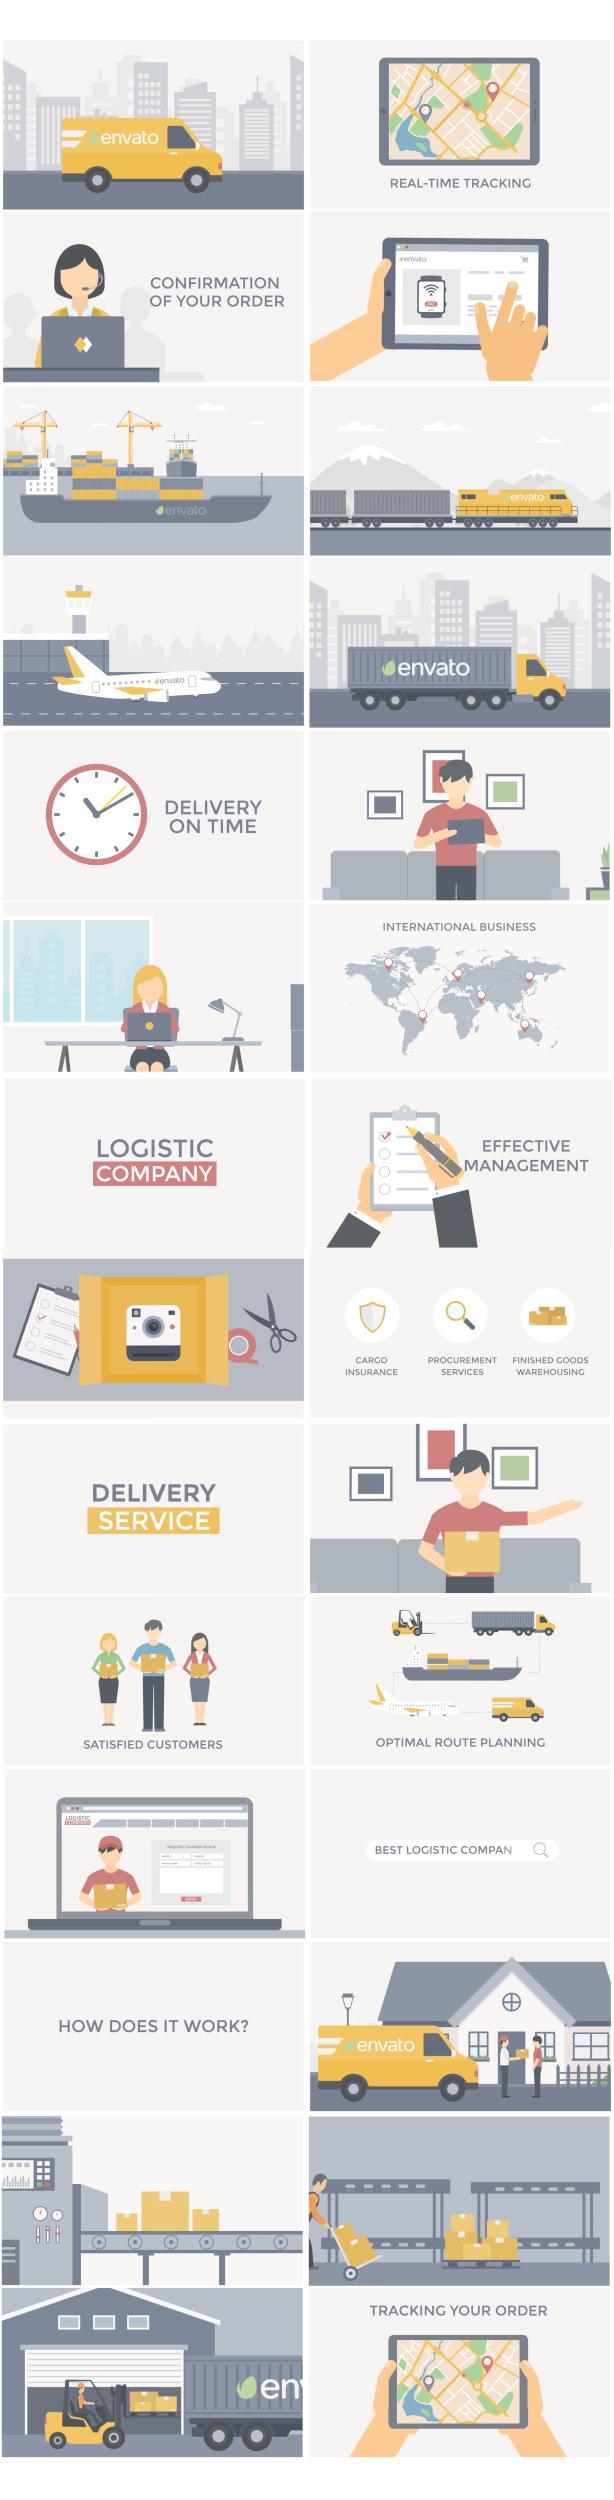 Logistics Delivery Promo - 3